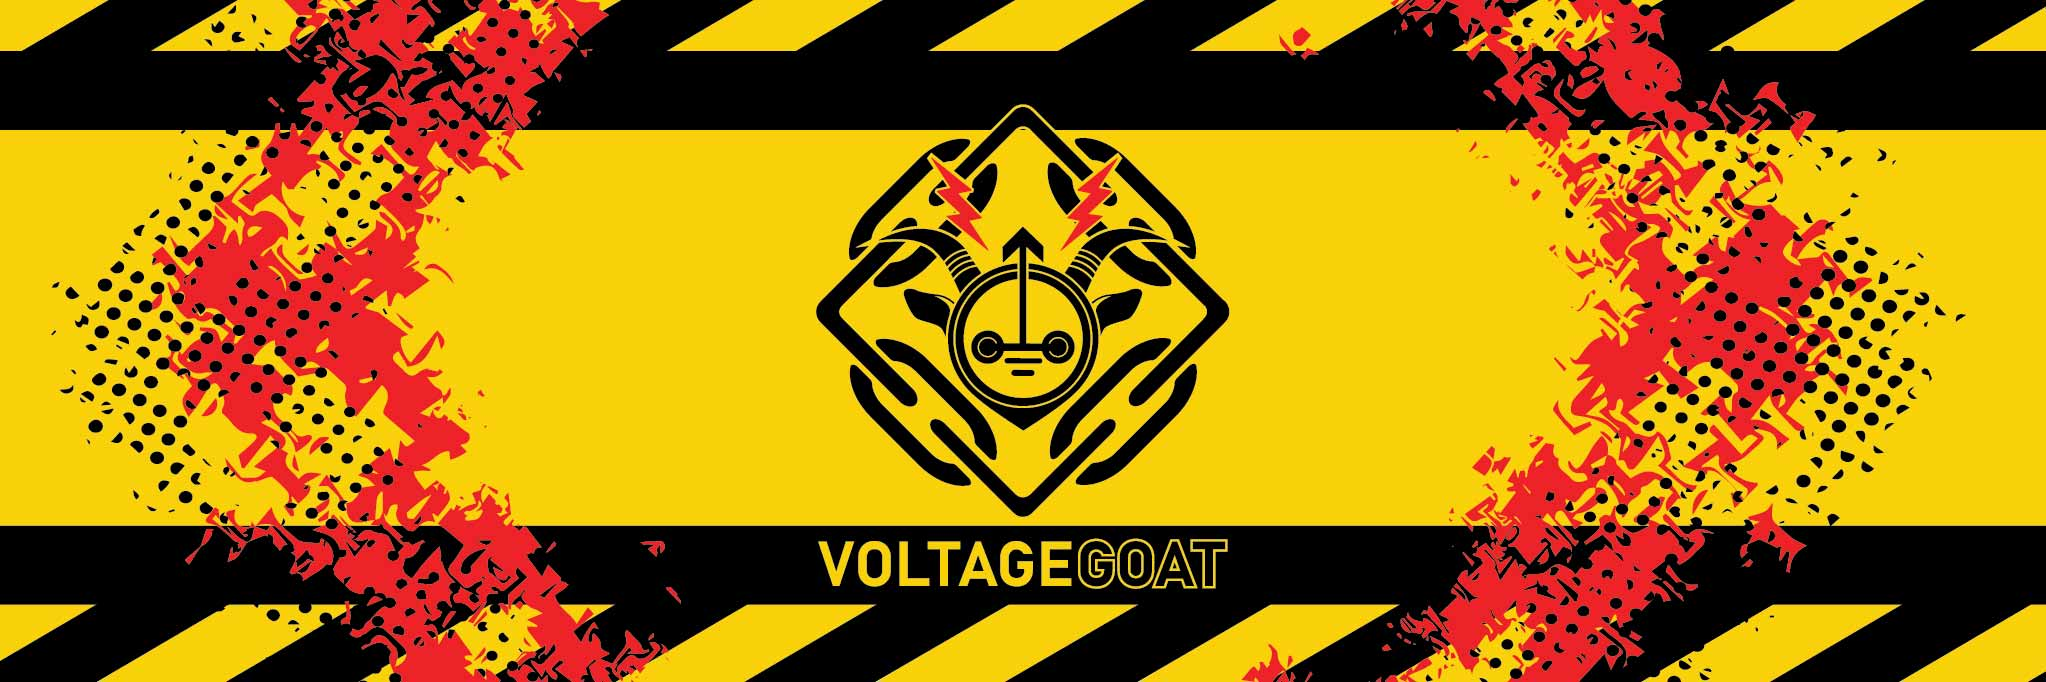 VOLTAGE GOAT